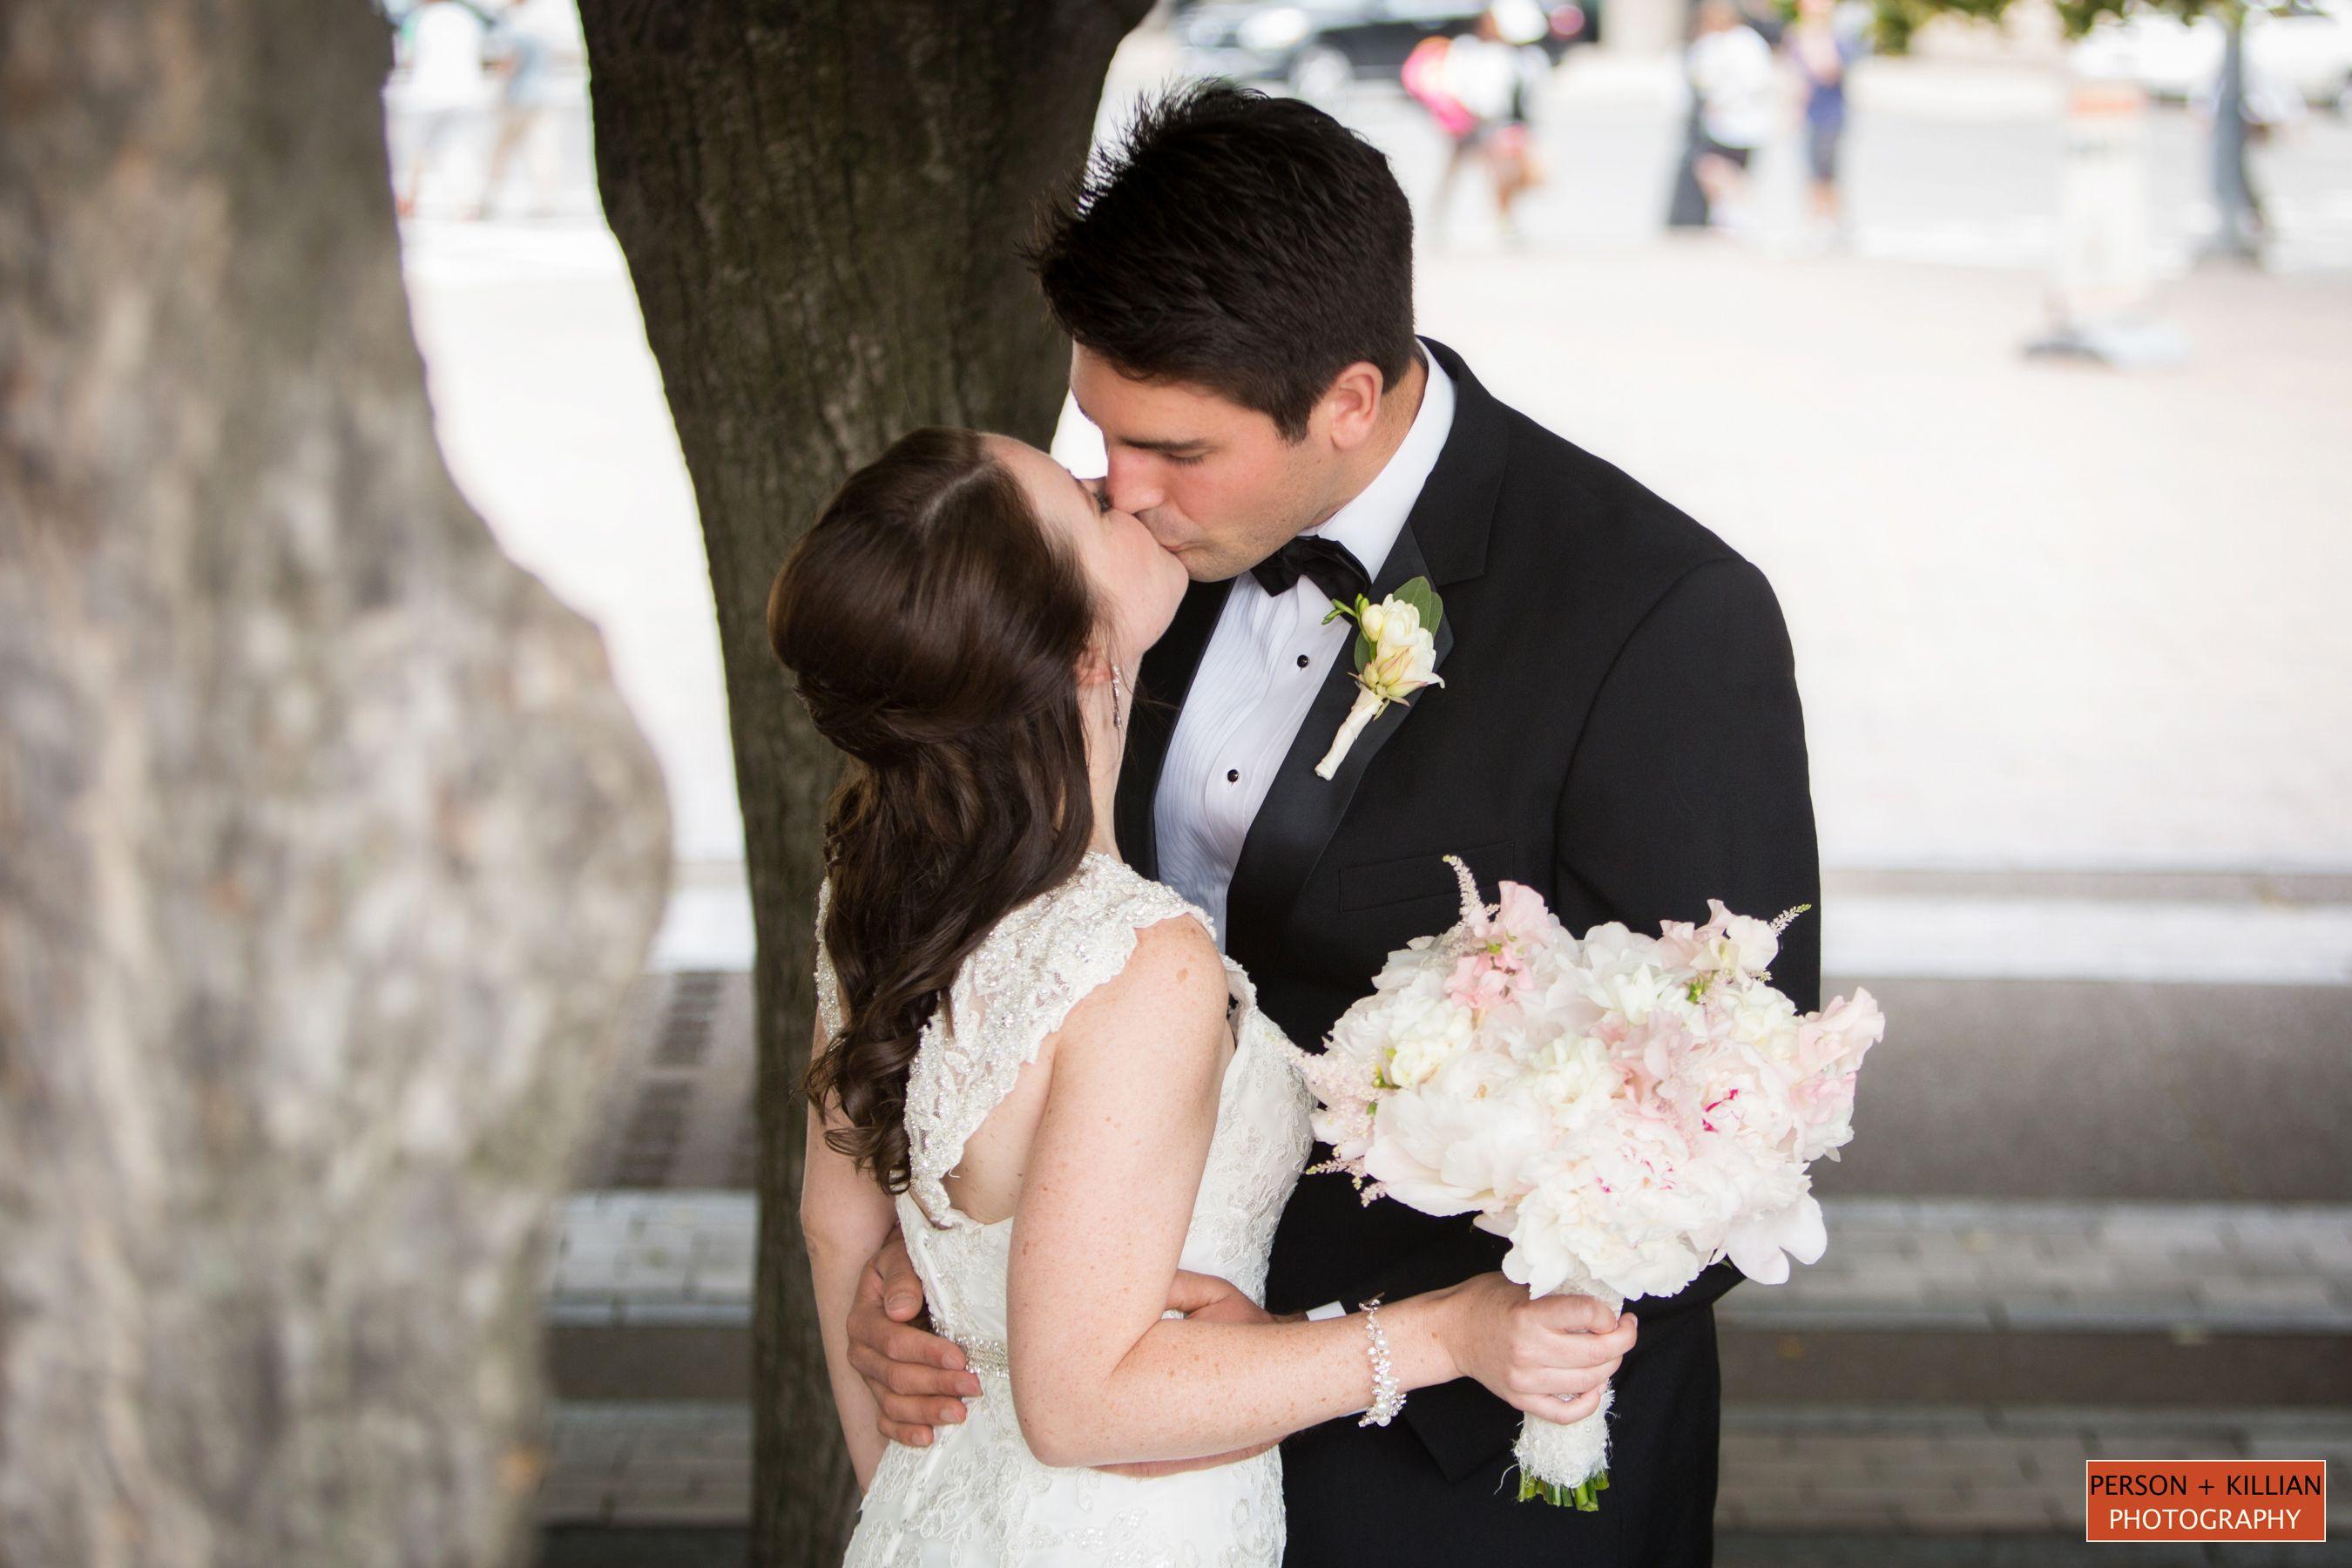 Downtown boston summertime weddings christian science center plaza